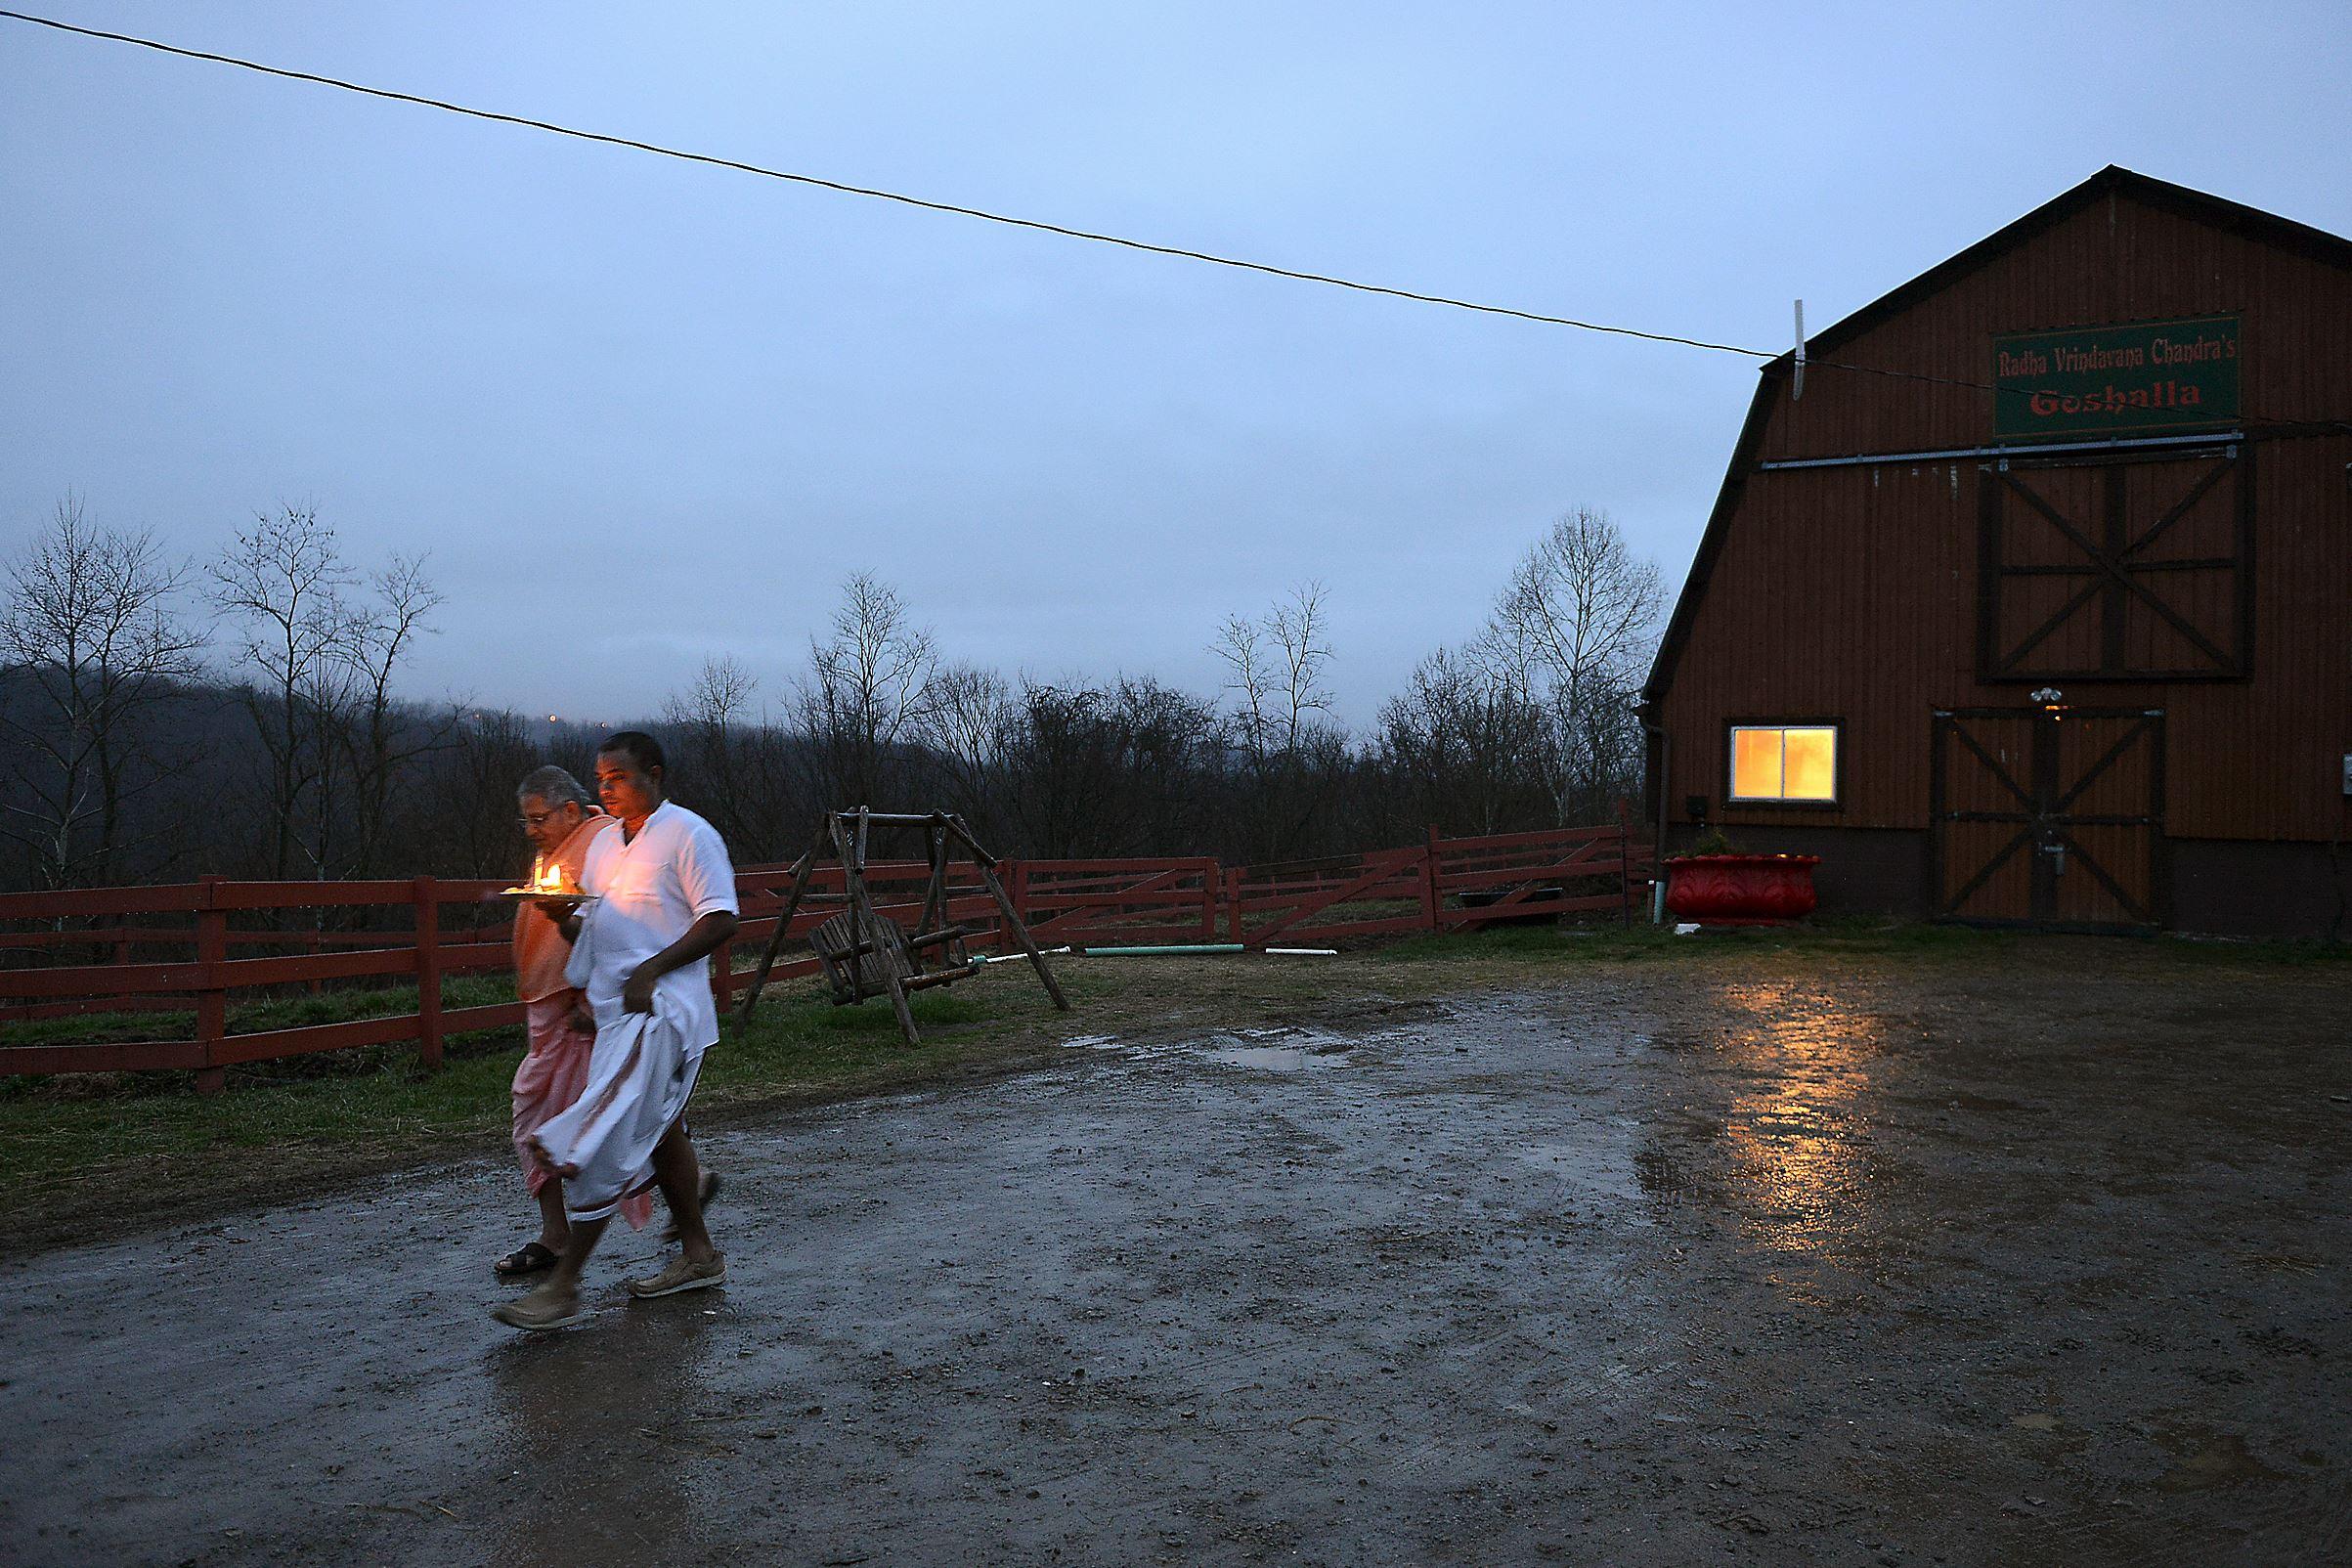 20151210JR-NewVrindaban5-6 Sri Rupa, 46, and Venkadesha Krishna Das, 77, leave the cow barn to return to the Temple for early morning worship Dec. 1.